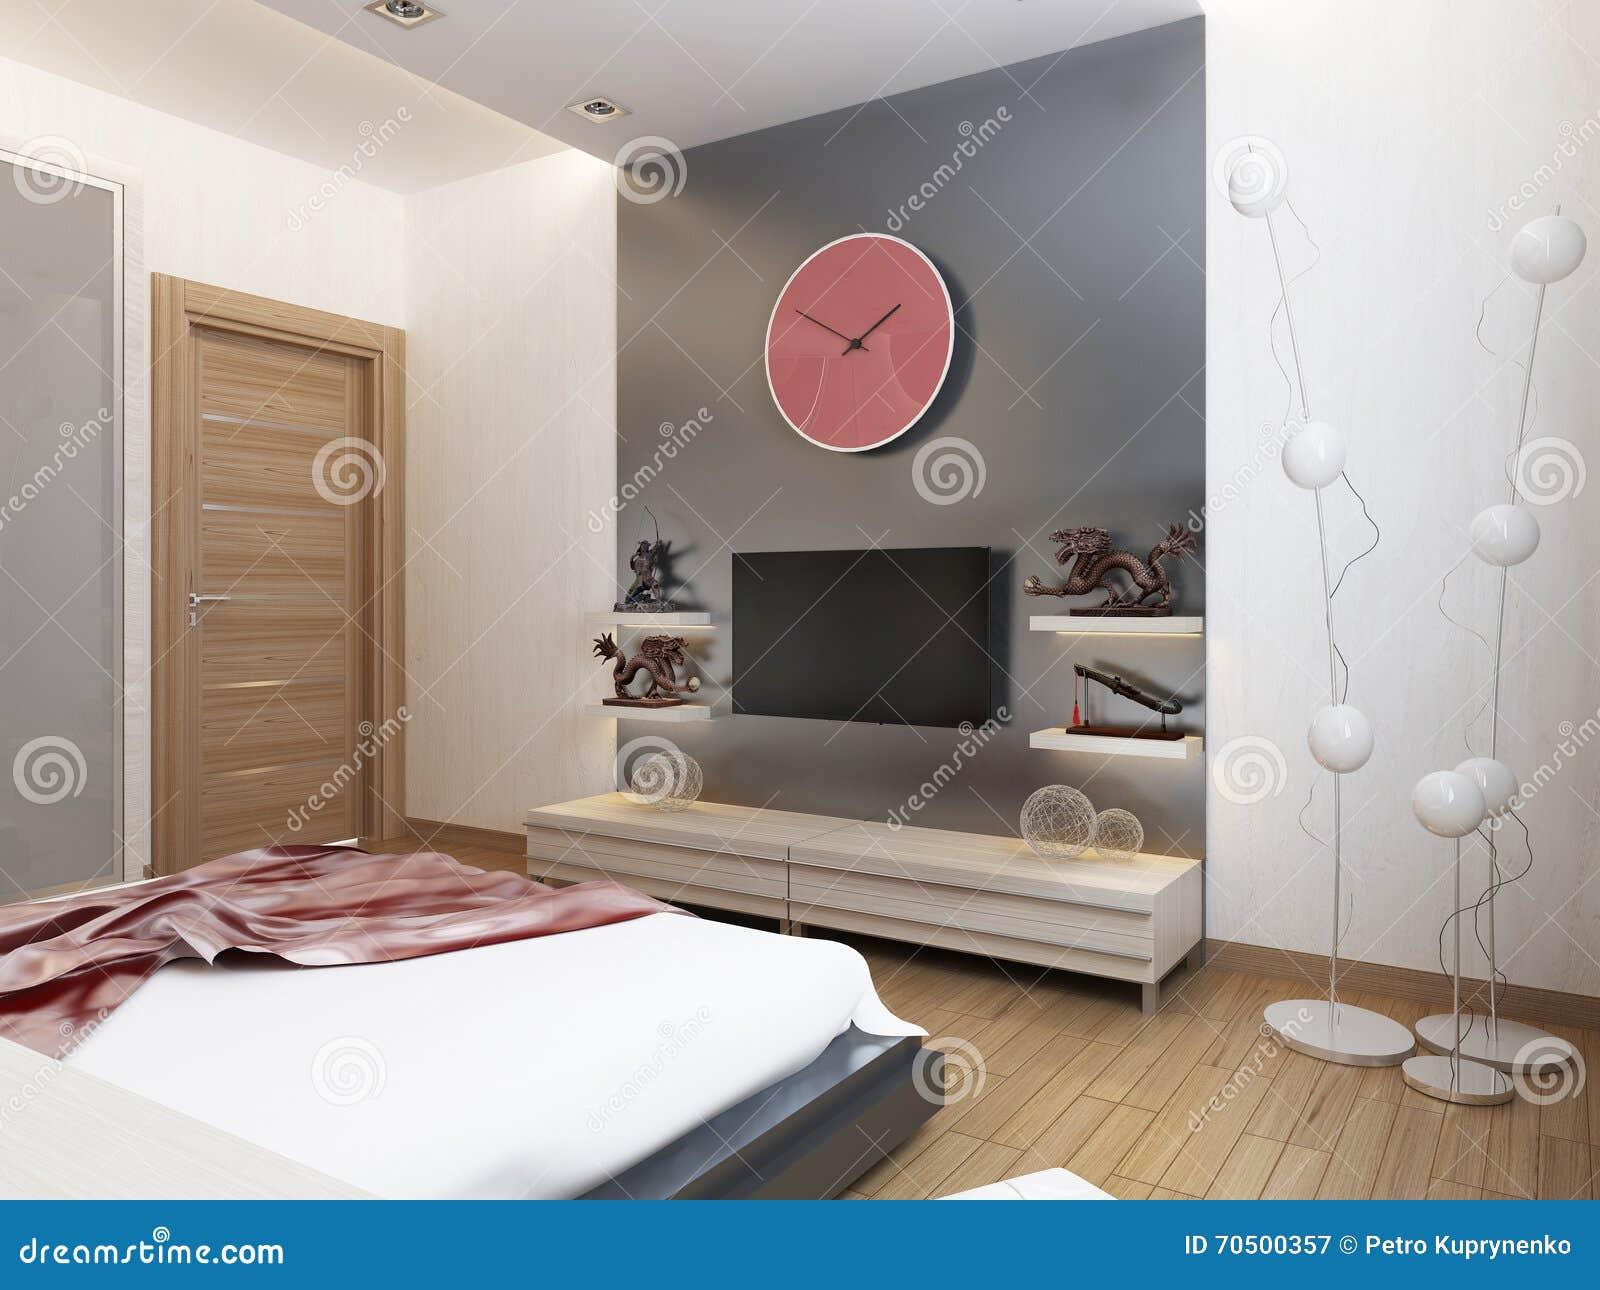 Tv Półki I Spiżarnia Pod Tv W Sypialni Obraz Stock Obraz